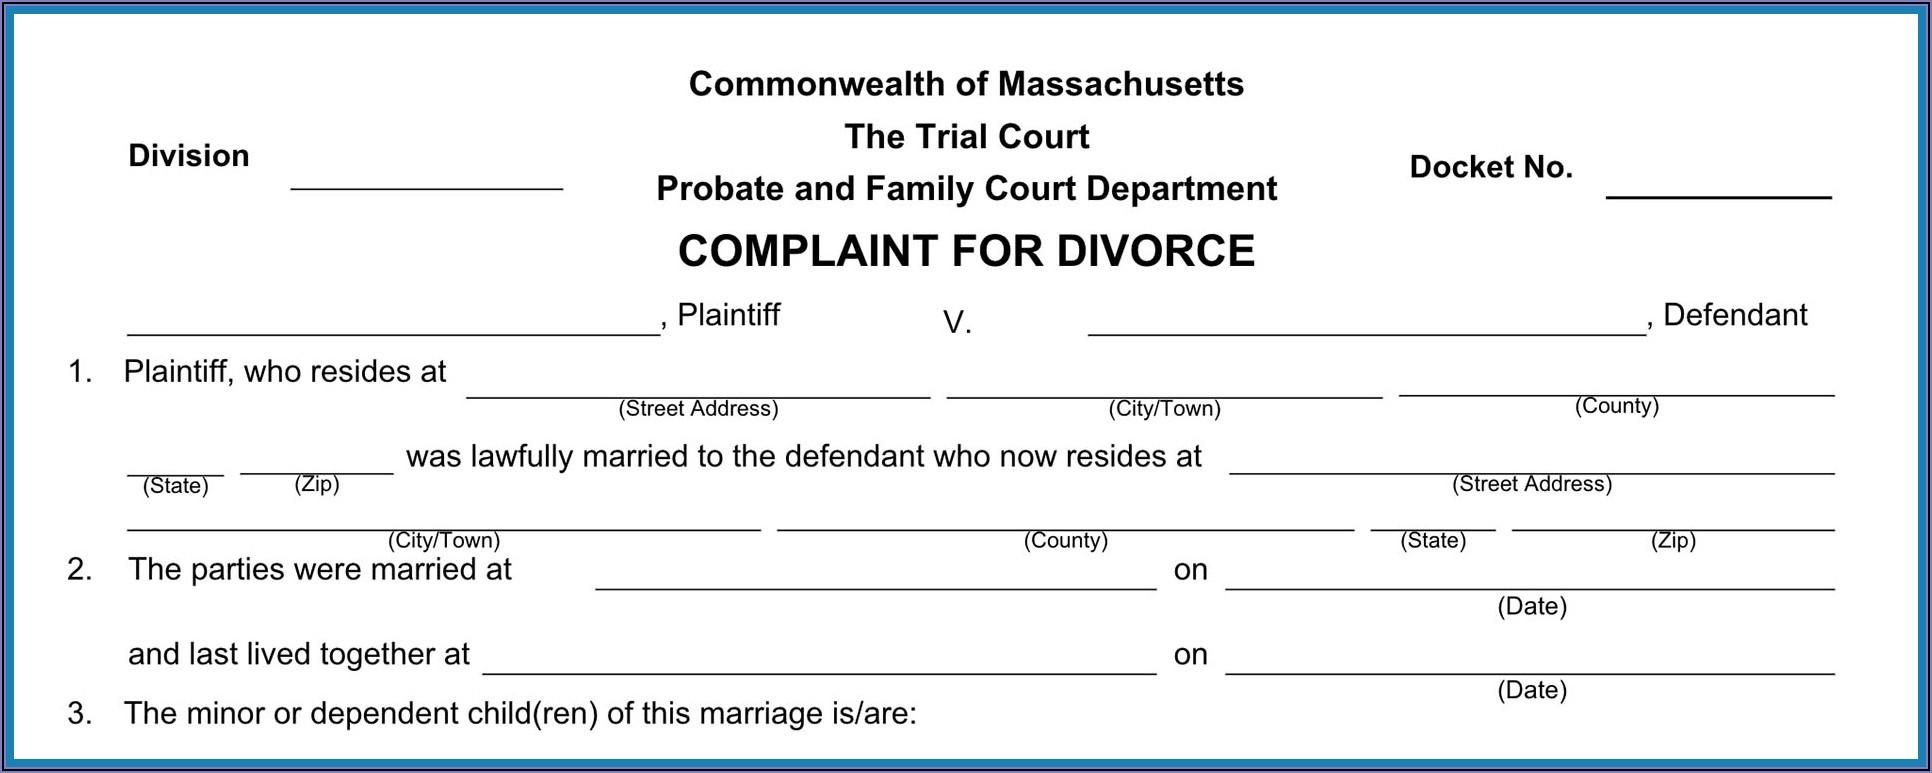 Massachusetts Divorce Court Forms